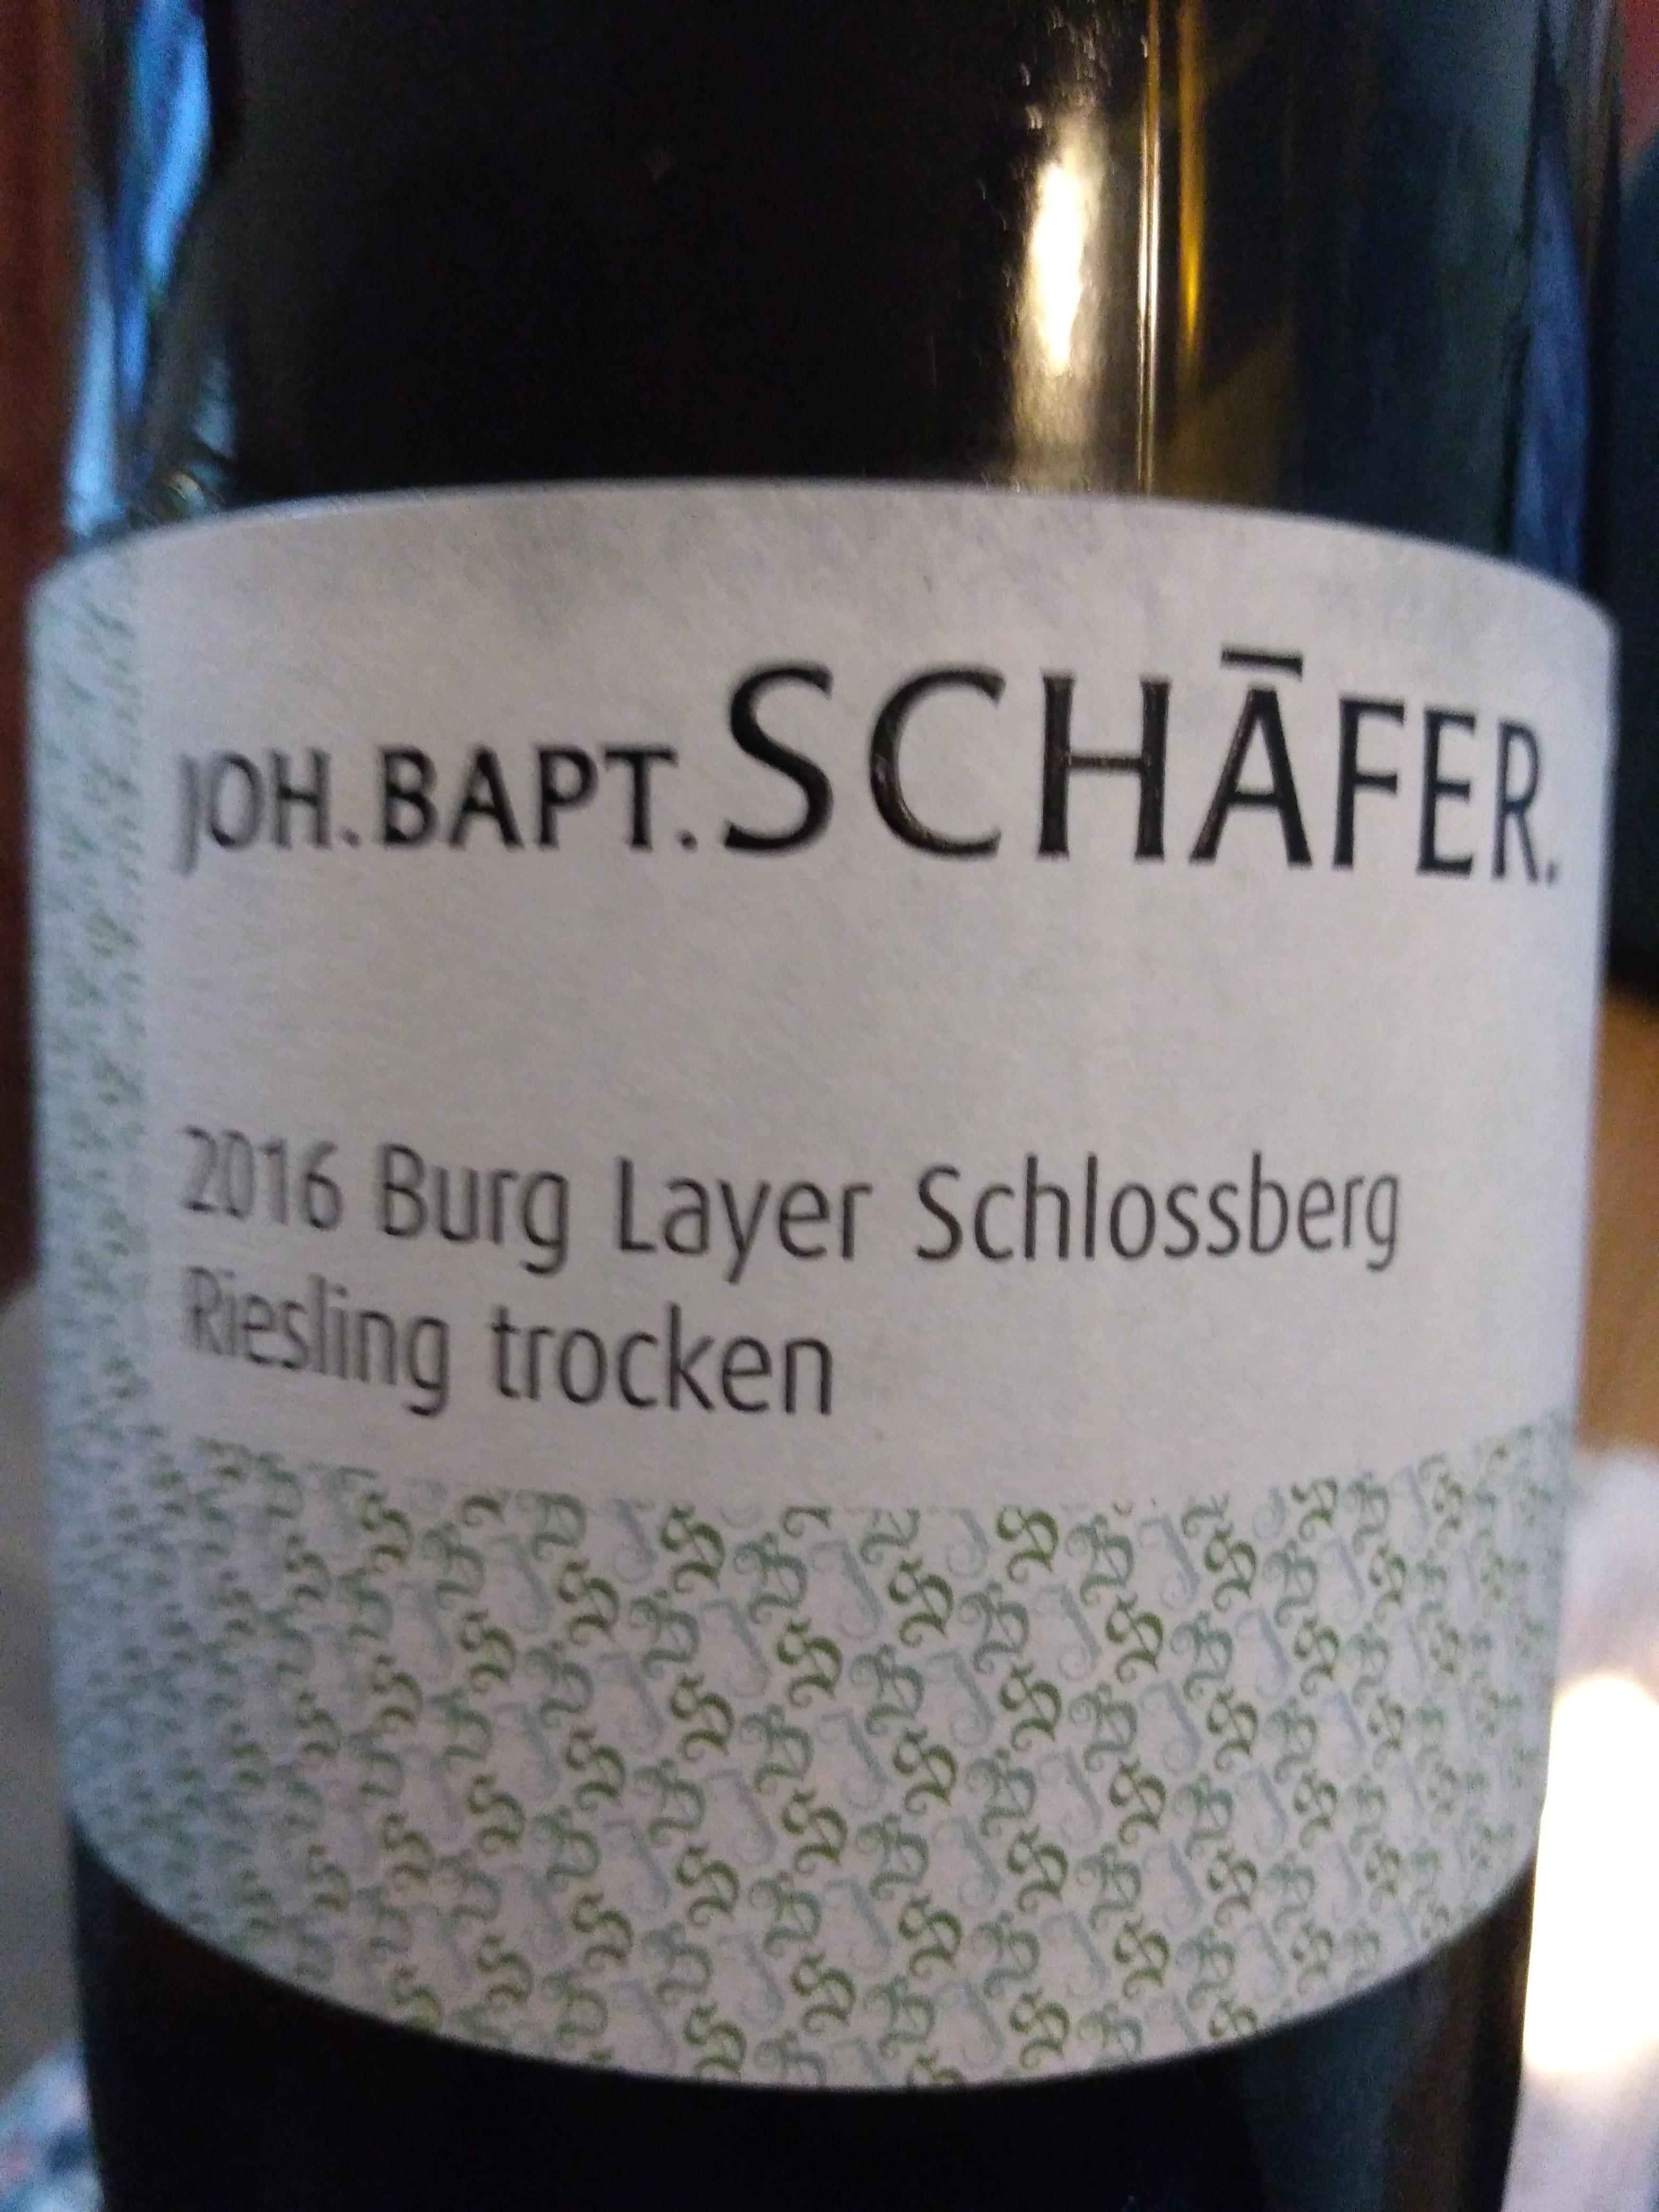 Nahe Burg Layer Schlossberg Riesling trocken 2016 - Joh. Bapt. Schäfer